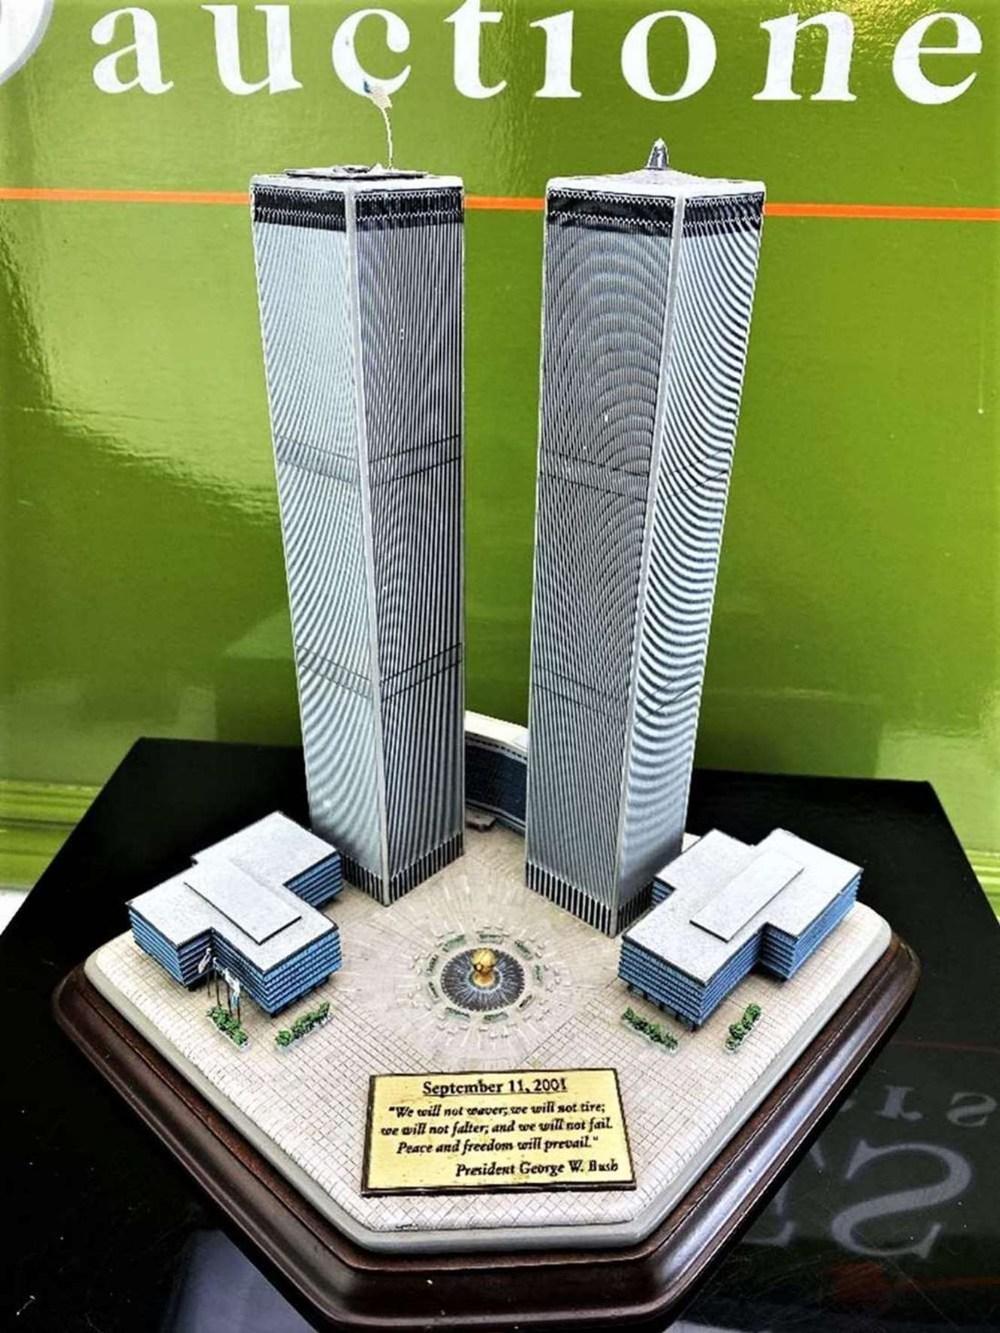 Danbury Mint September 11, 2001 9/11: Twin Towers Historic Desk Top Diarama